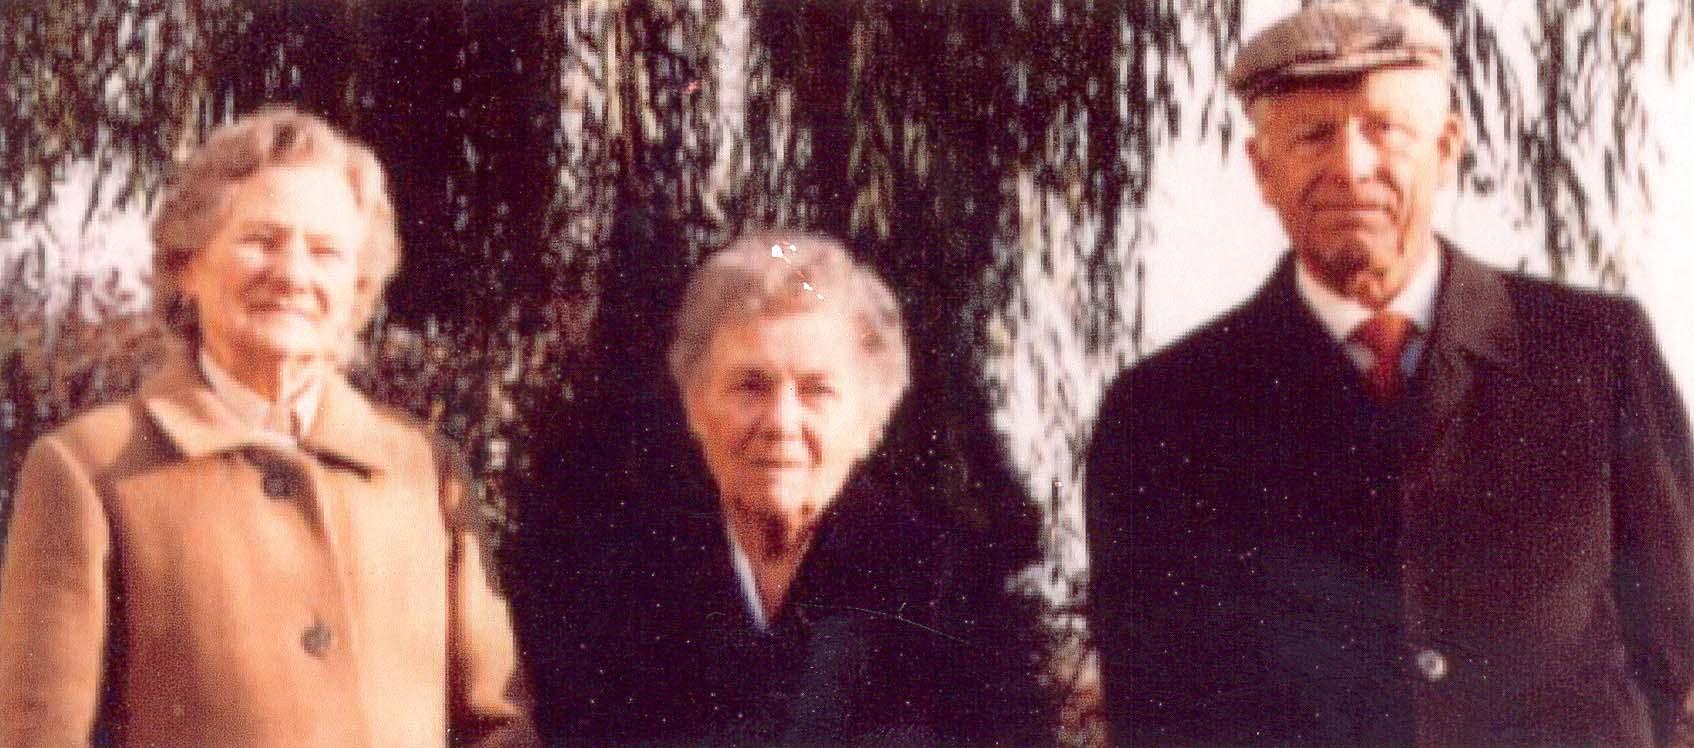 Left to right : Rizzetto Carlotta's sister , Rizzetto Carlotta and her brother-in-law , 1990